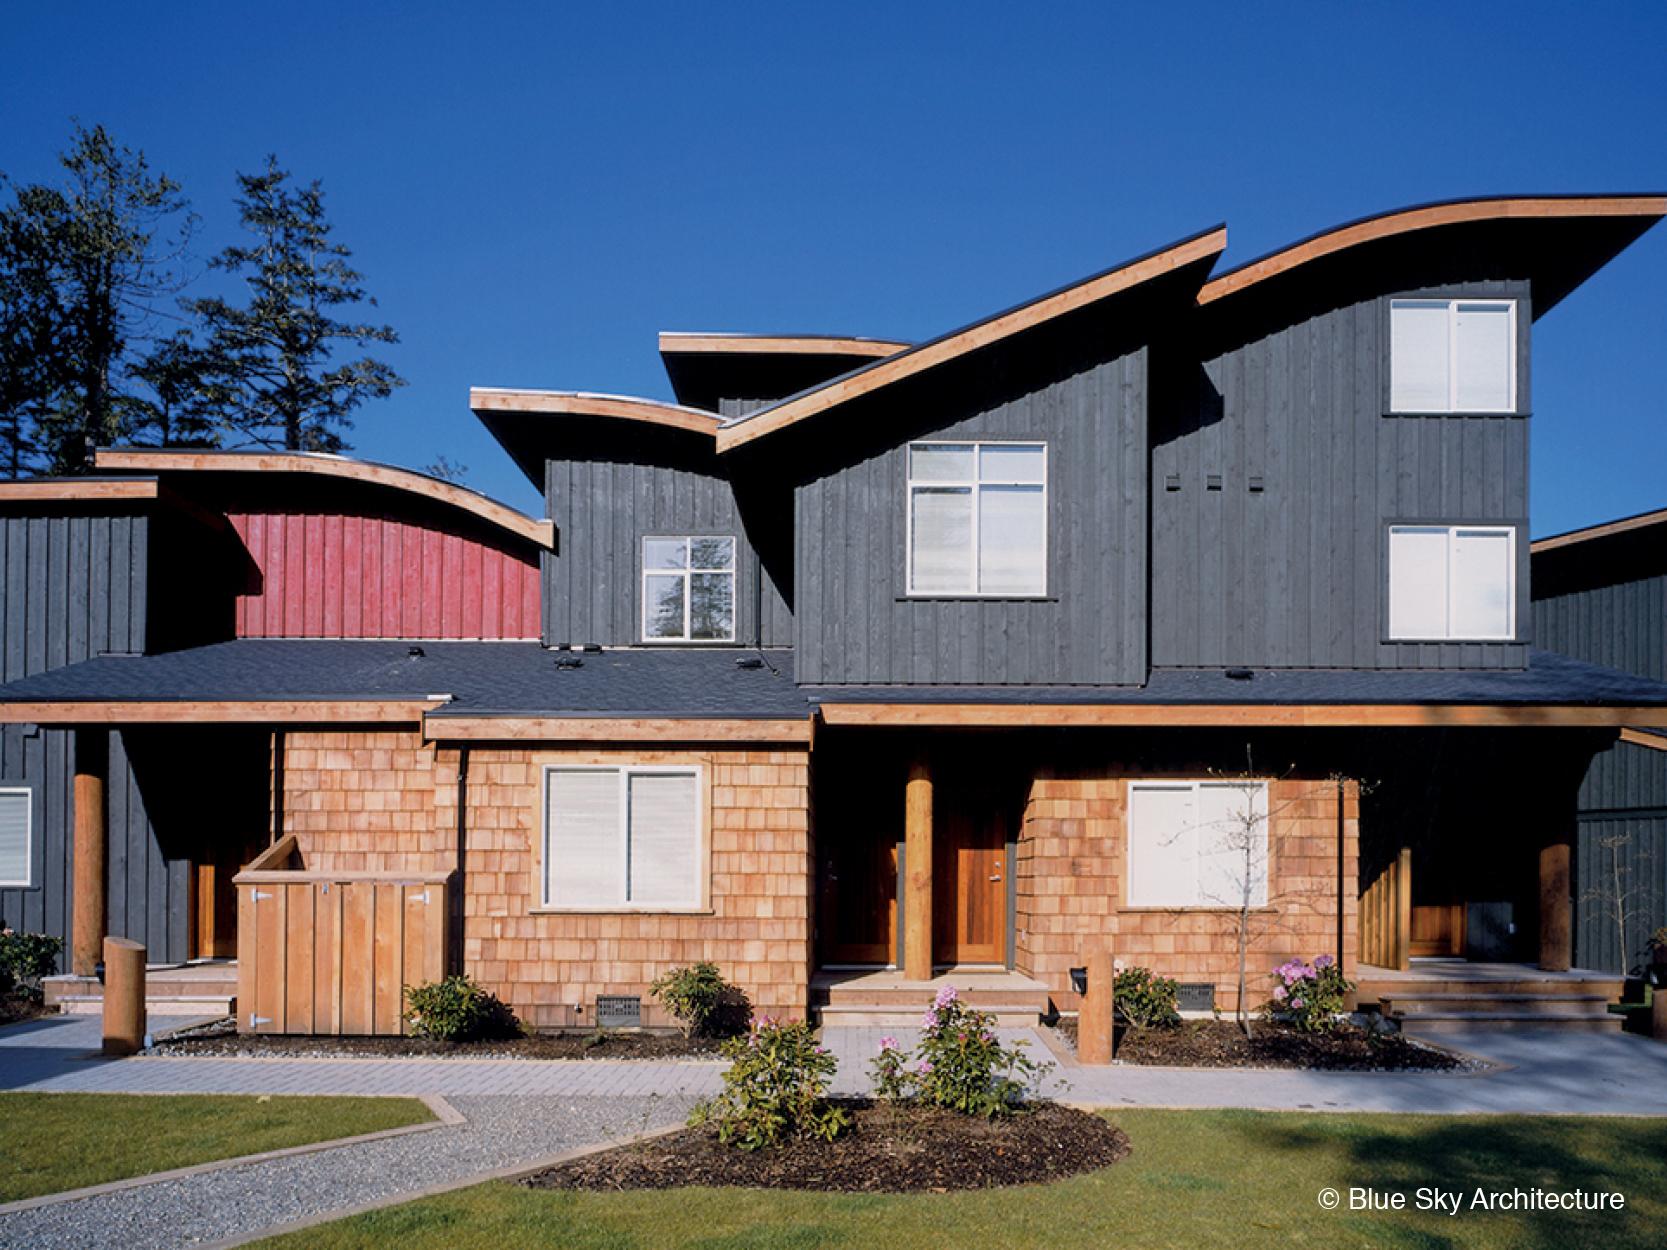 Multi Family Home with Cedar Cladding